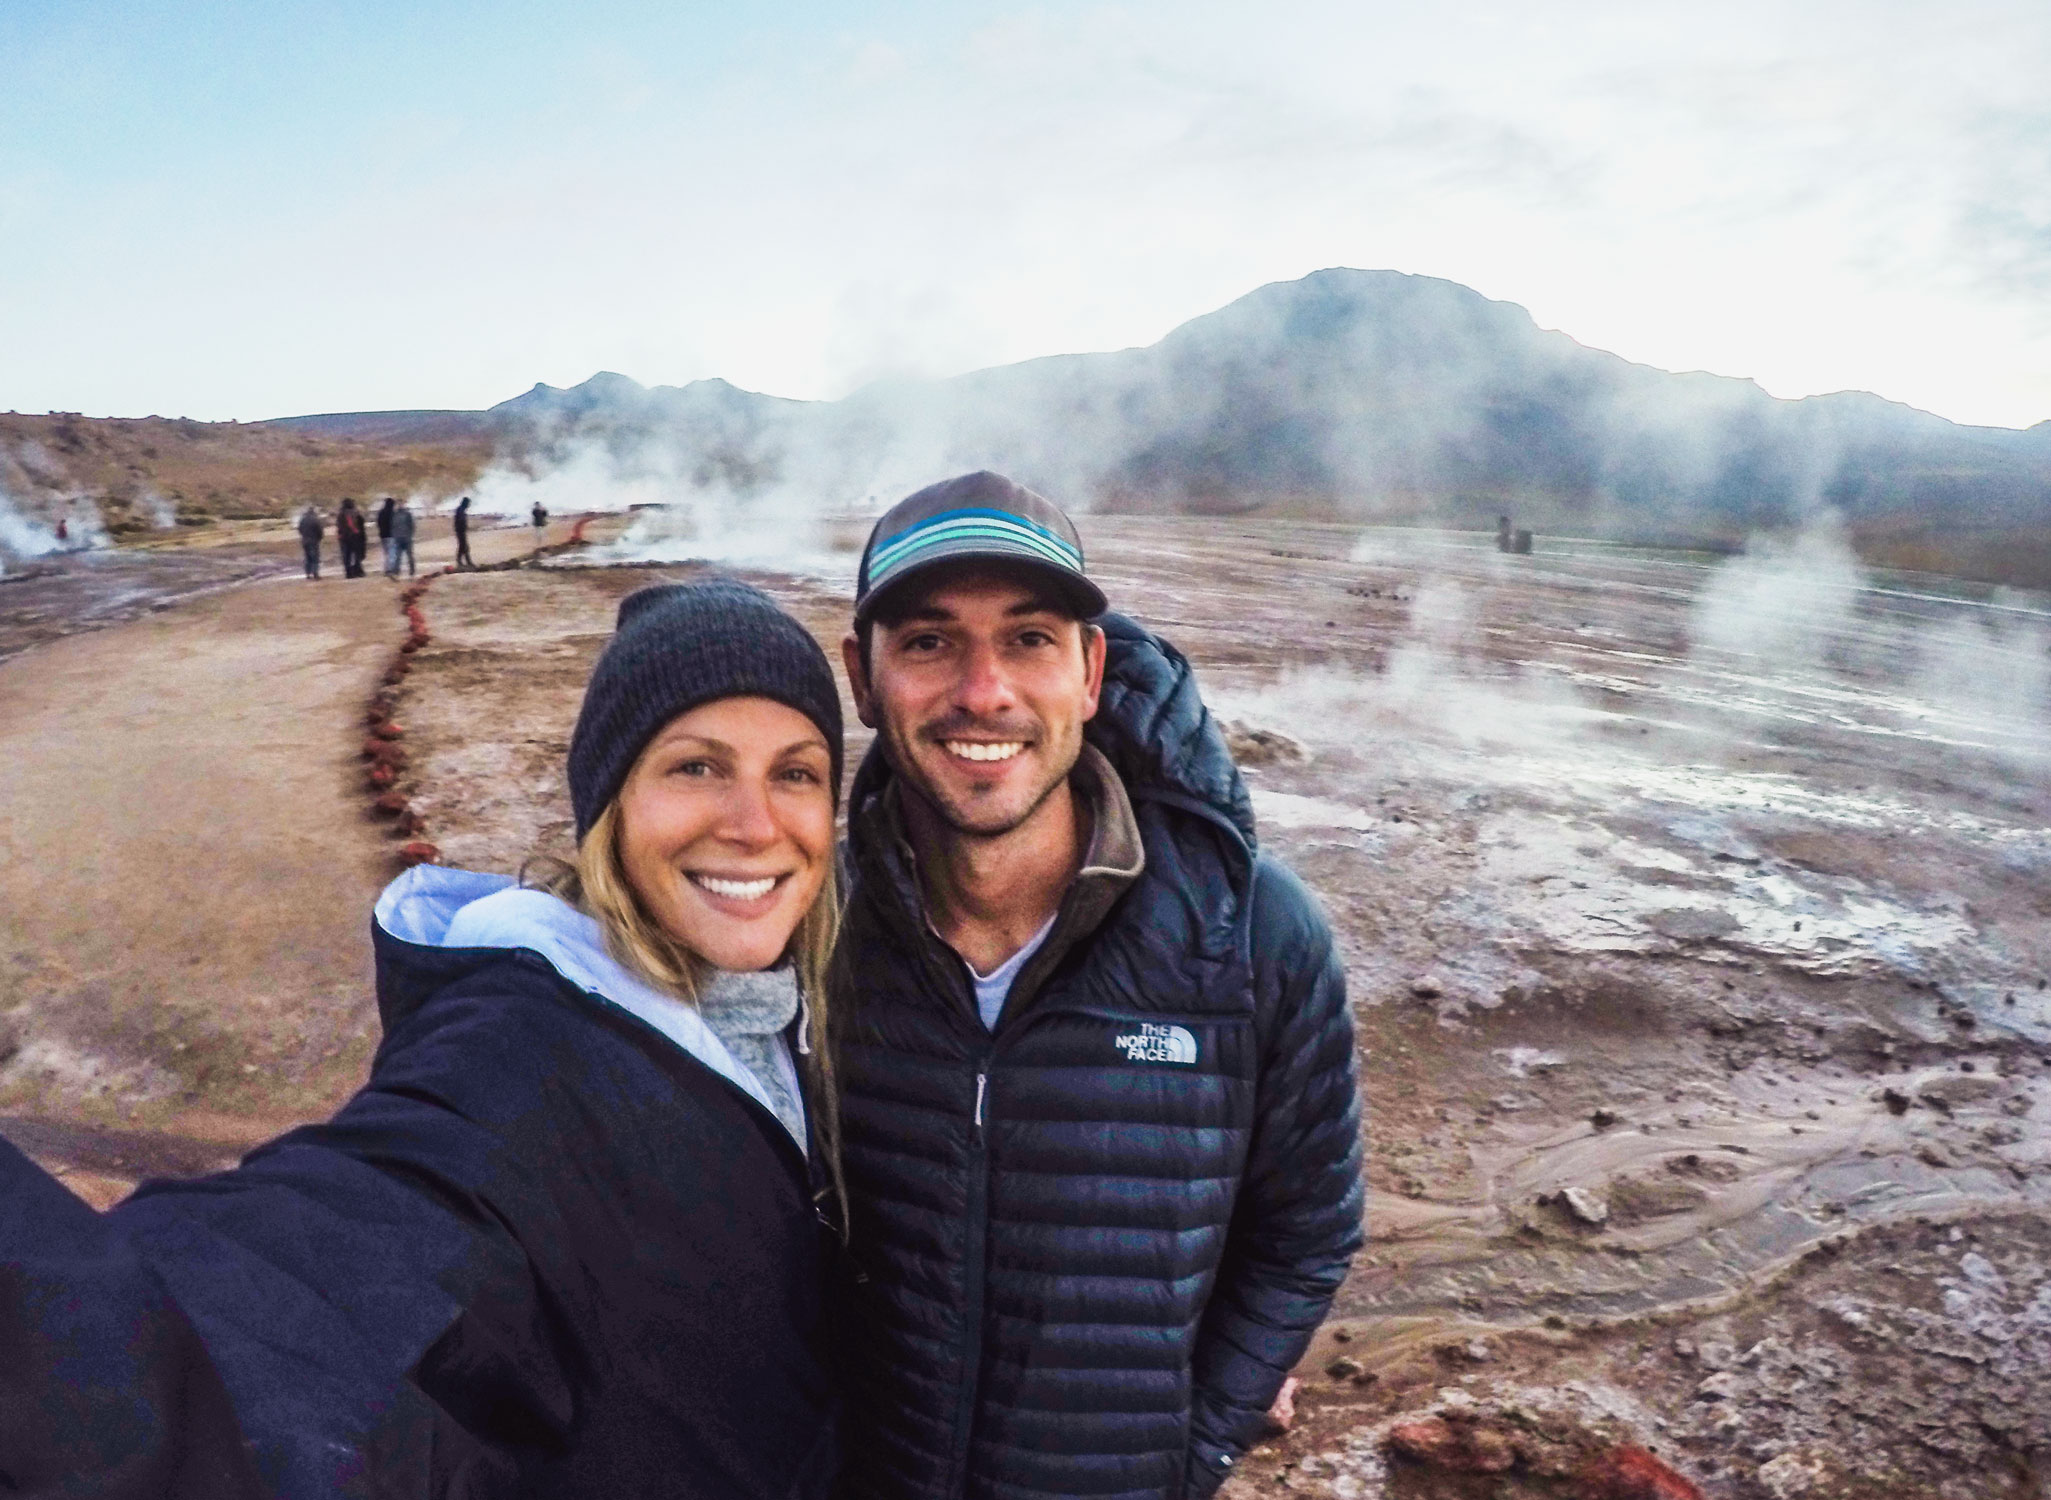 atacama-desert-chile-wander-south-el-tatio-geysers-morning-people.jpg